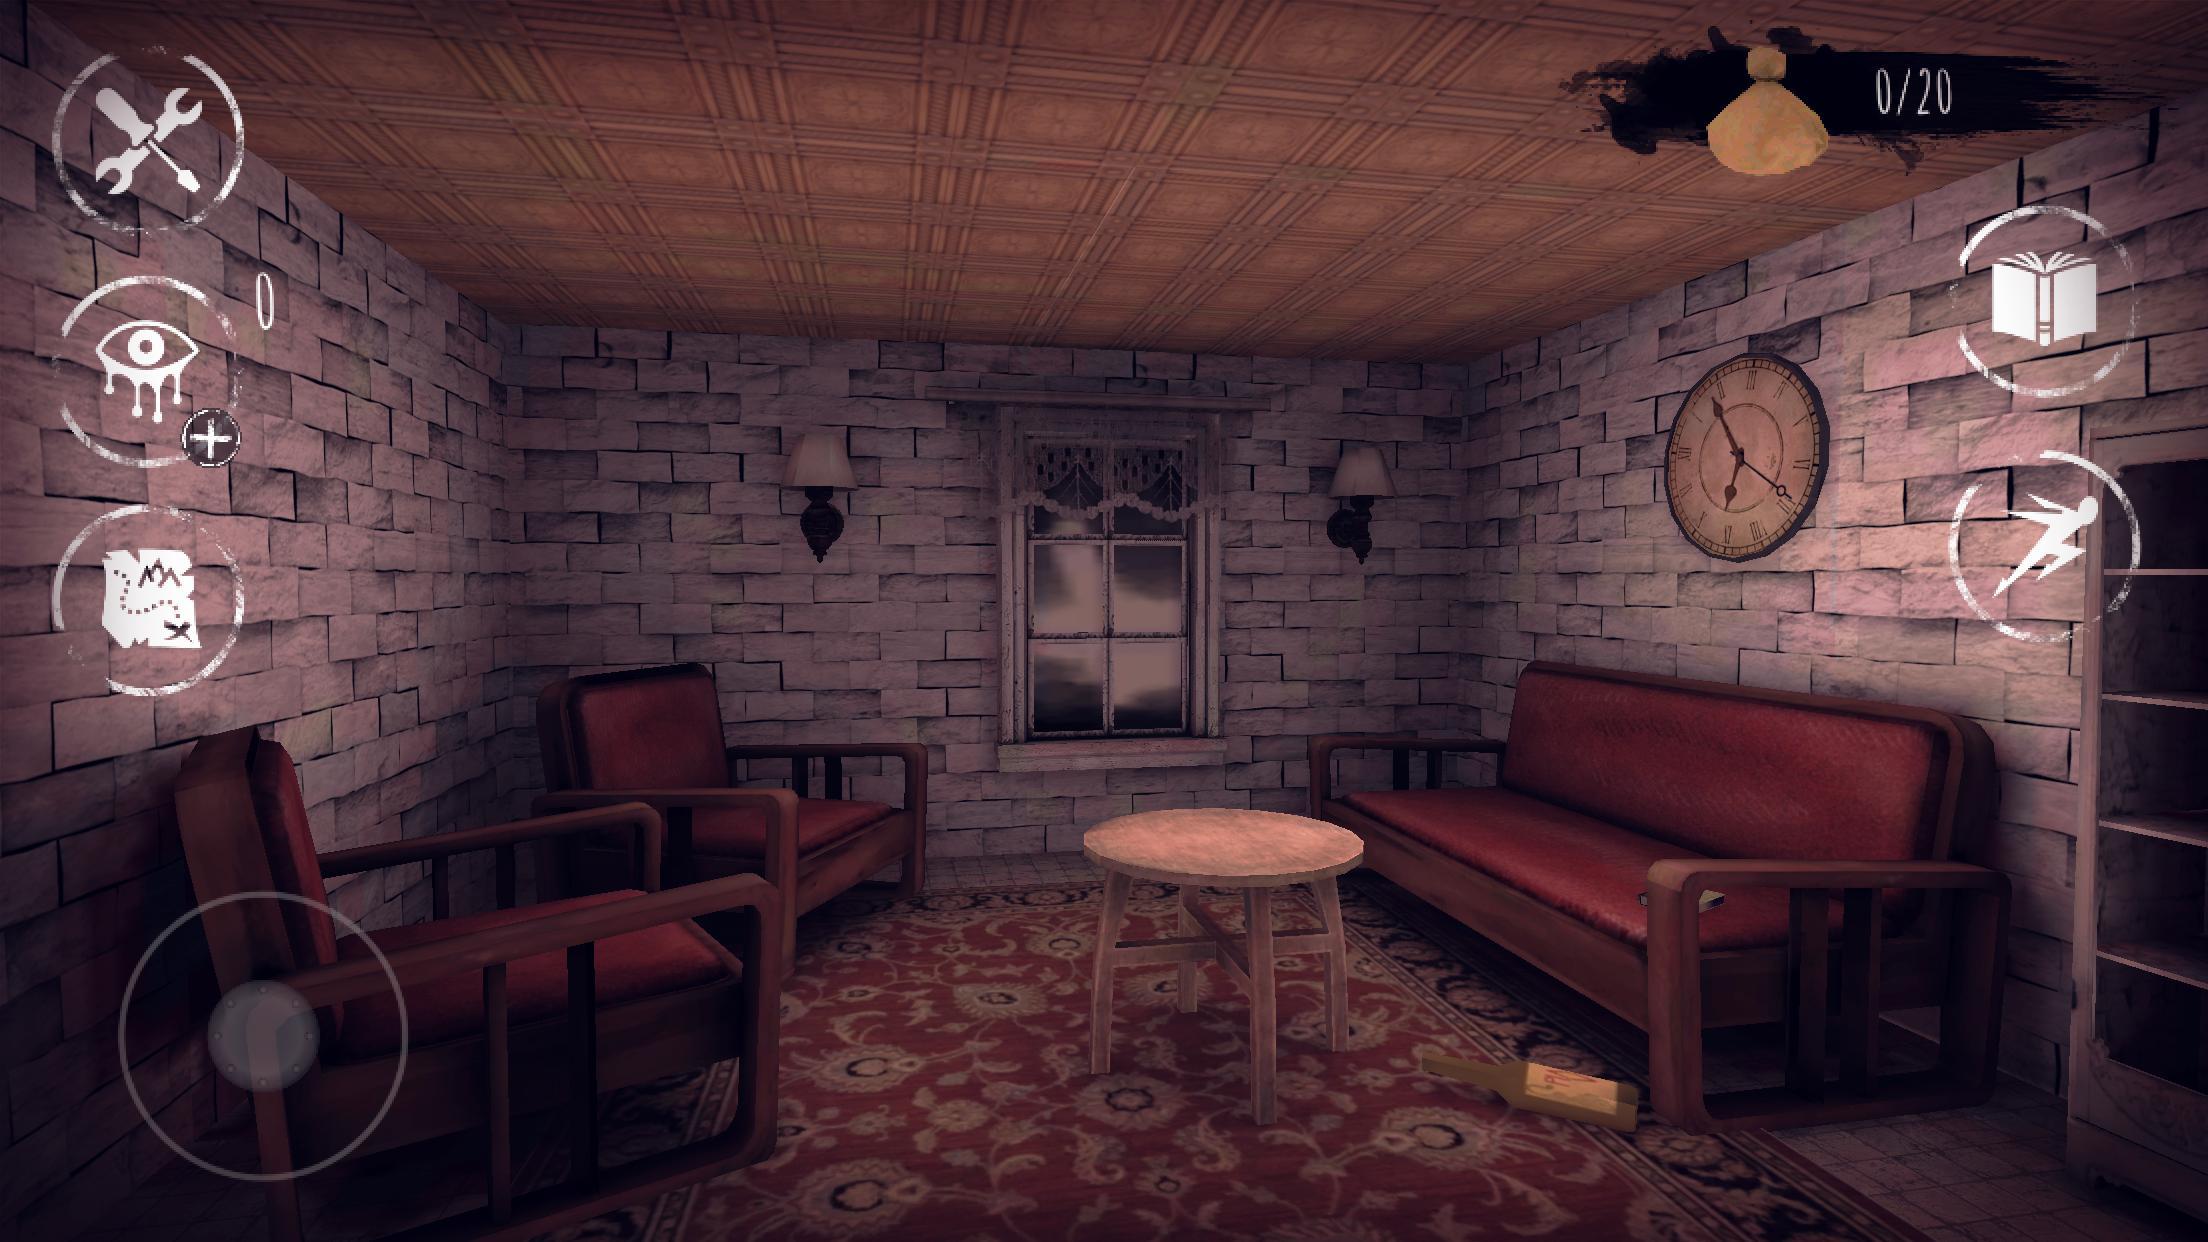 Eyes: Scary Thriller - Creepy Horror Game 6.1.21 Screenshot 18